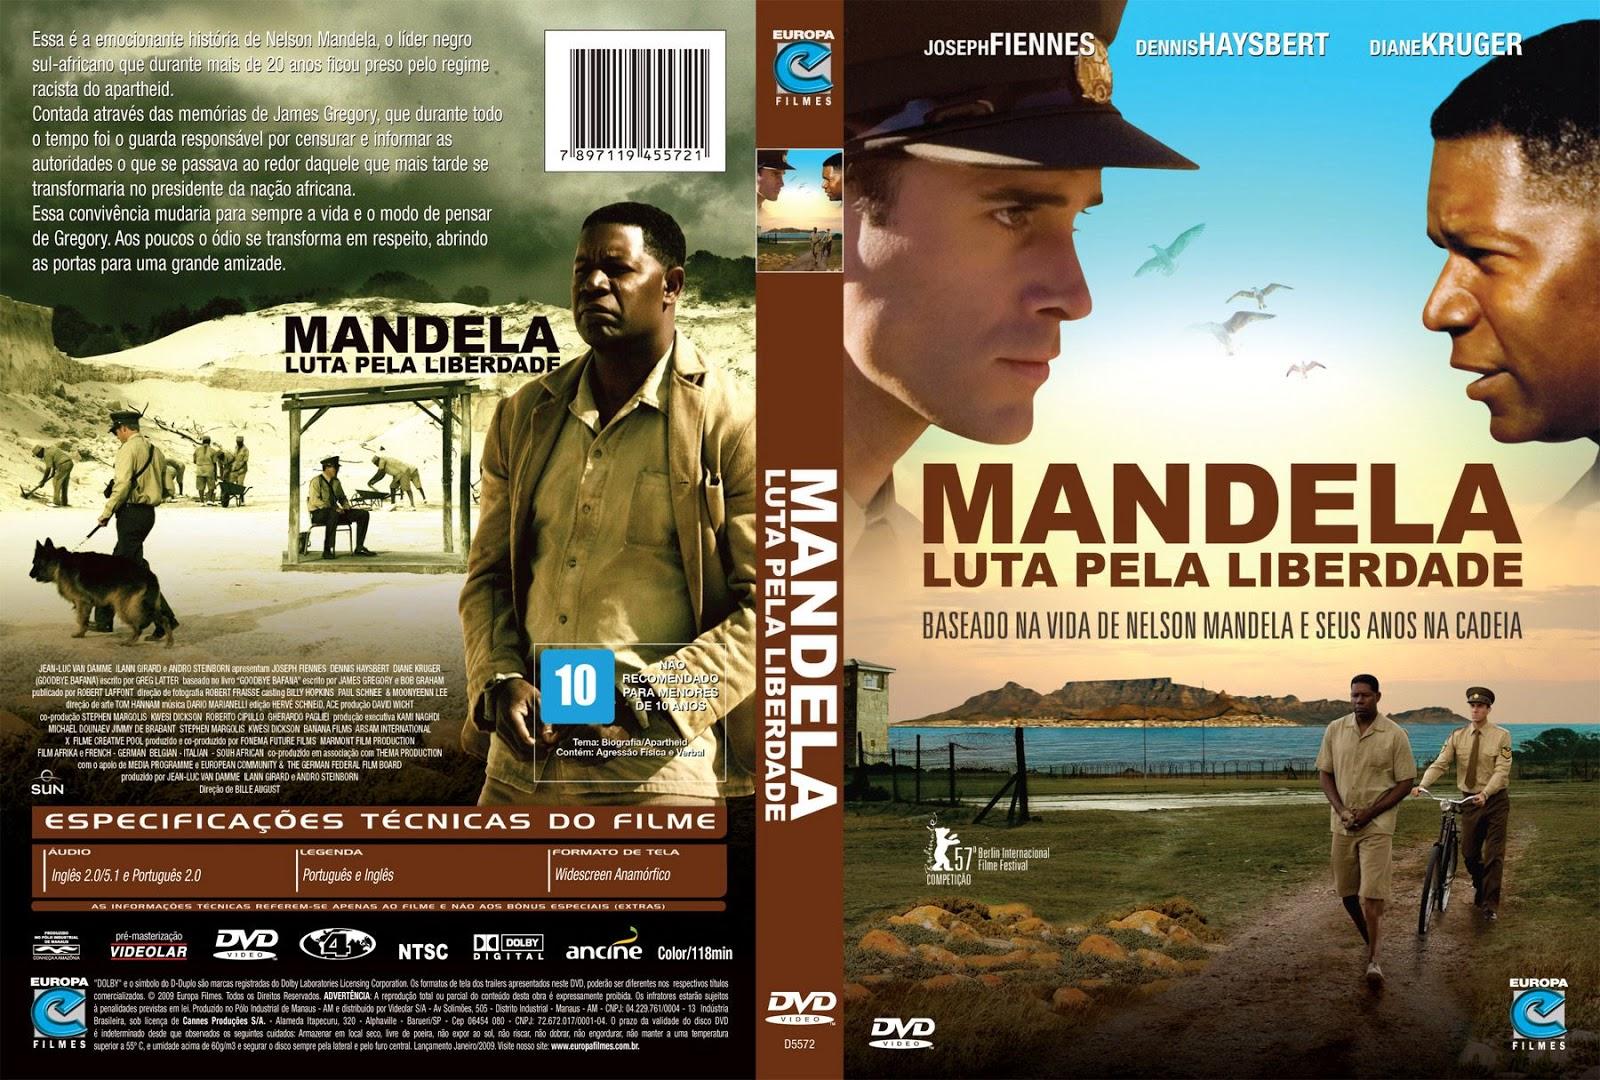 Capa DVD Mandela Luta Pela Liberdade